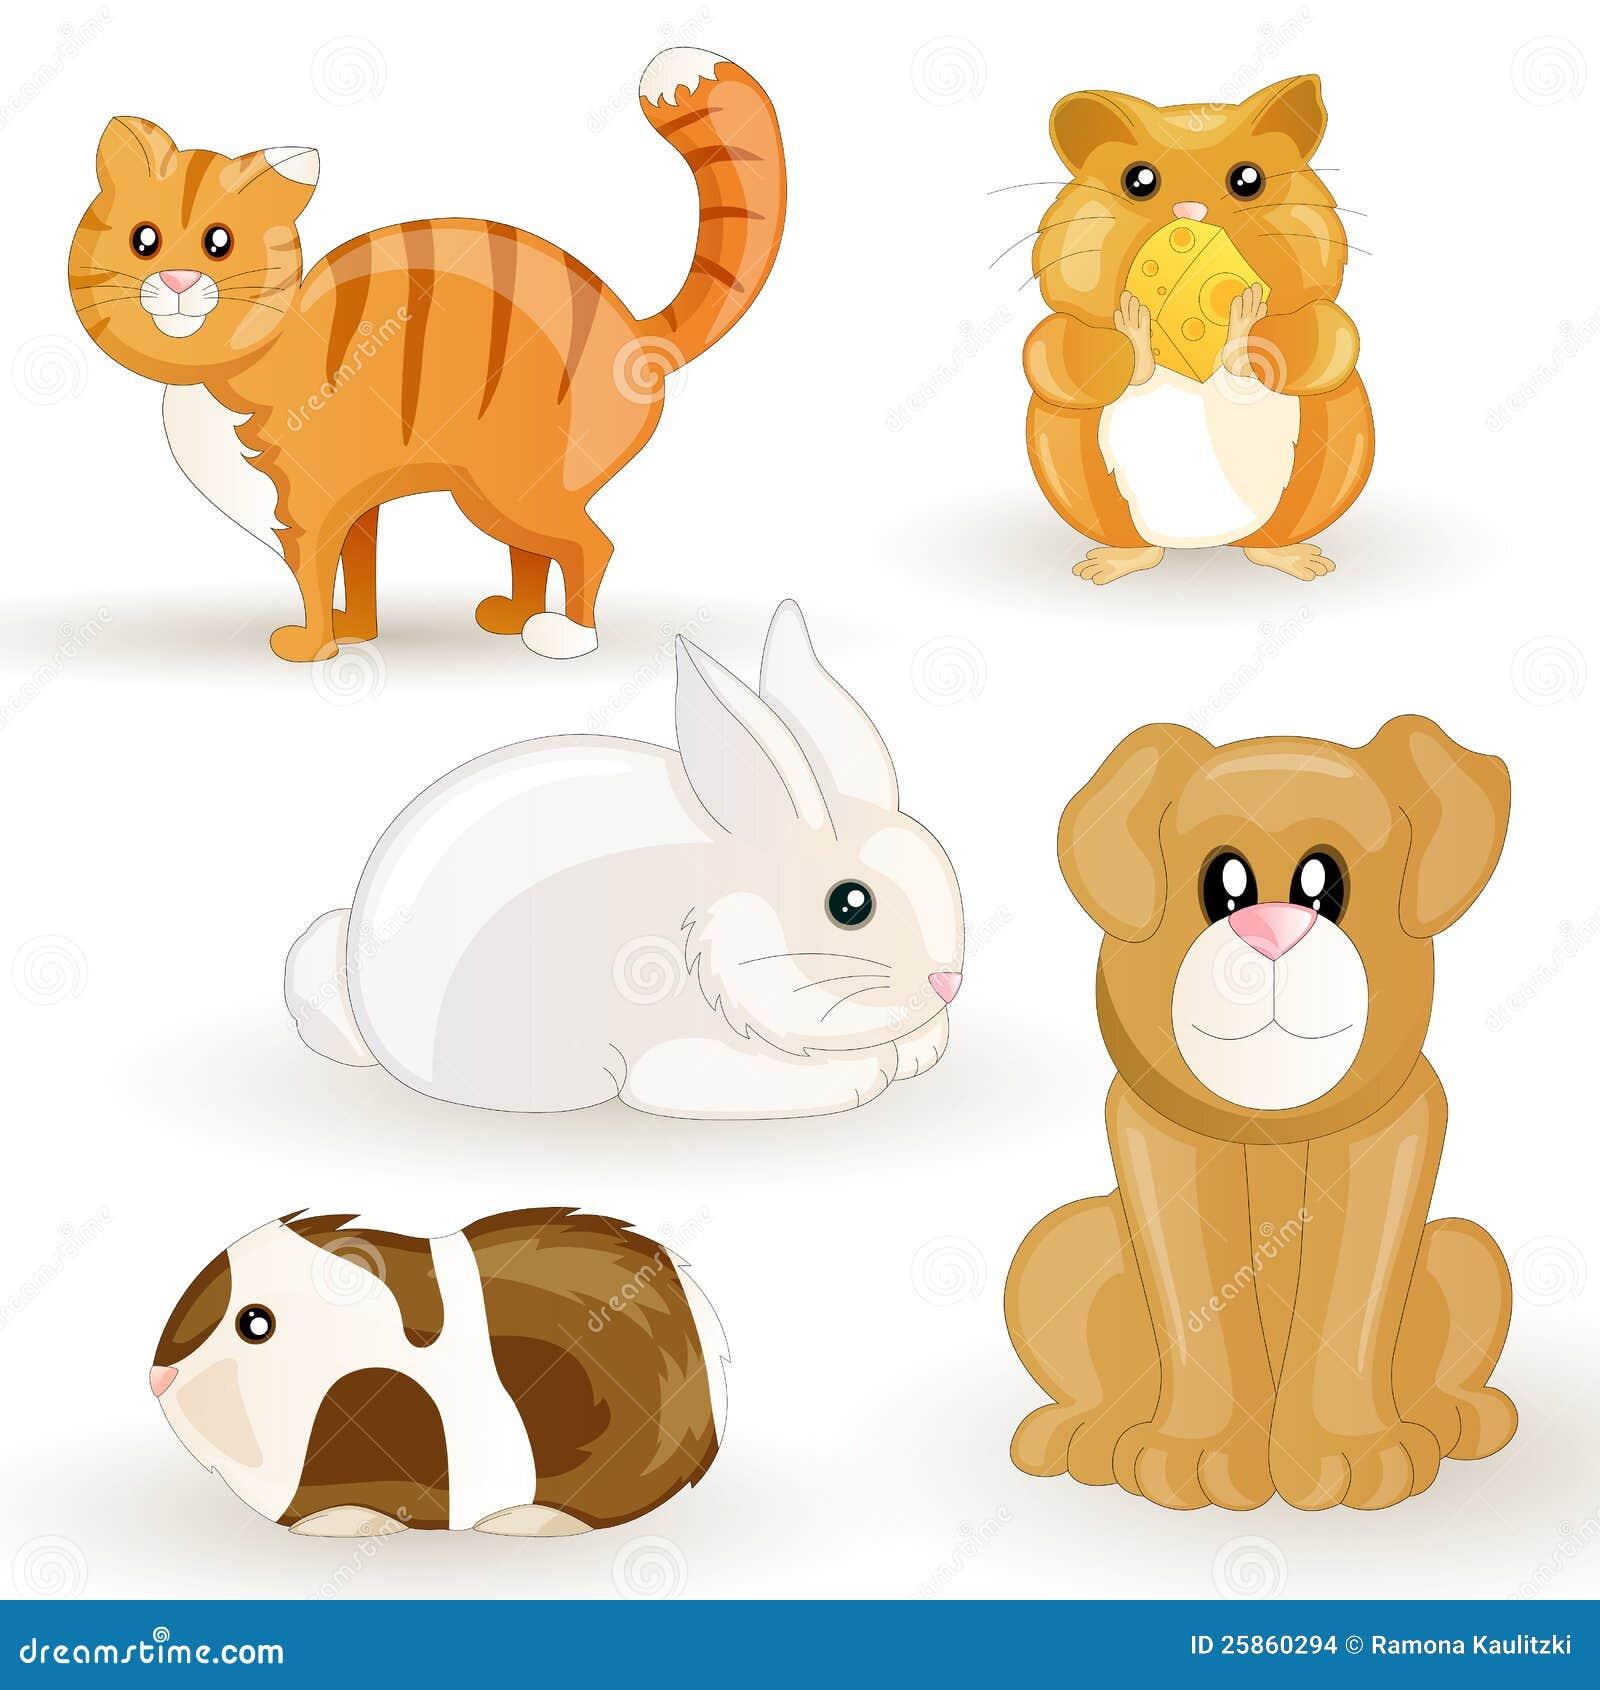 Cat And Dog Together Cartoon